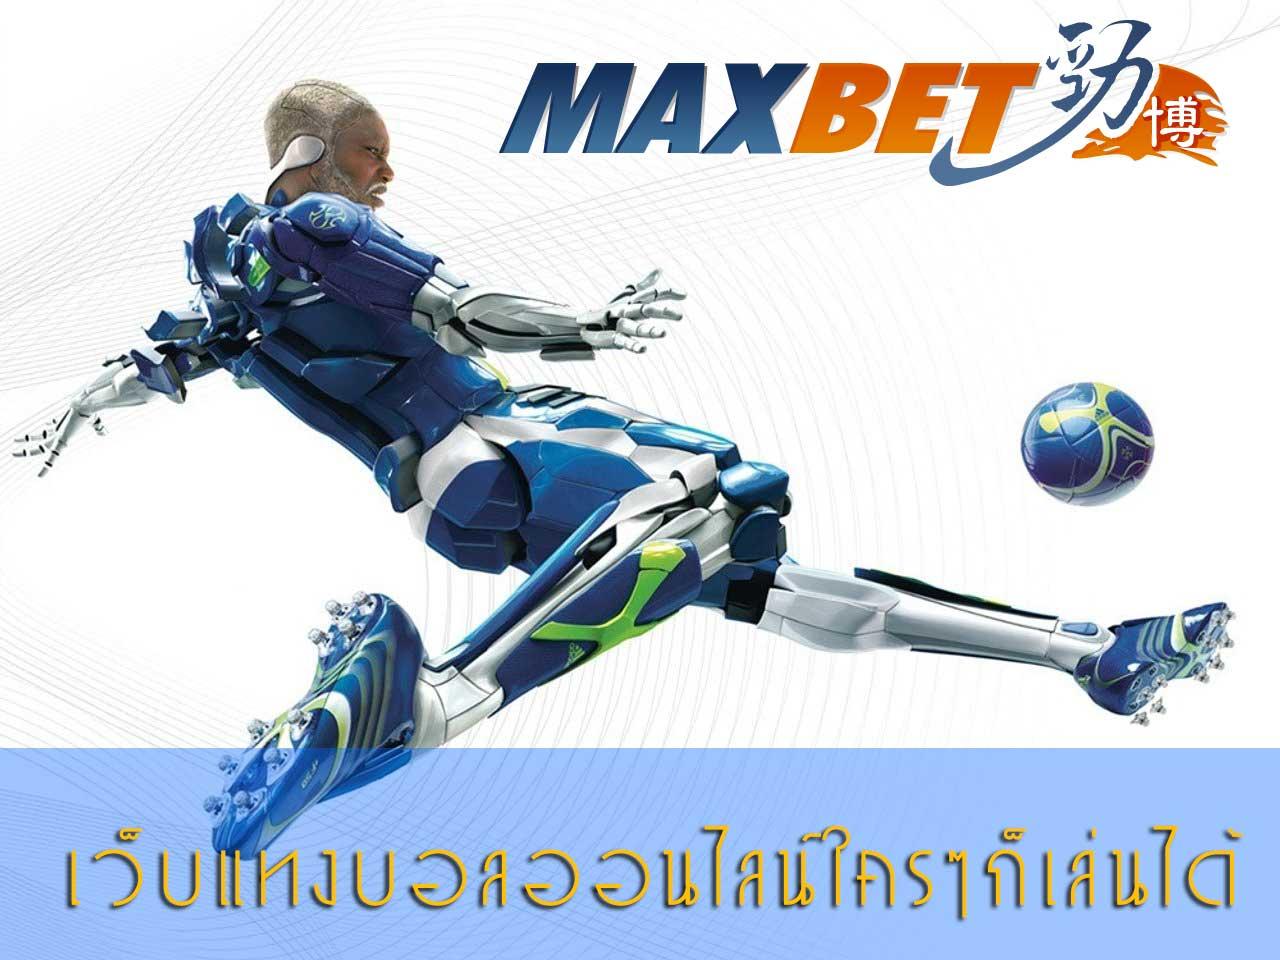 maxbetonline